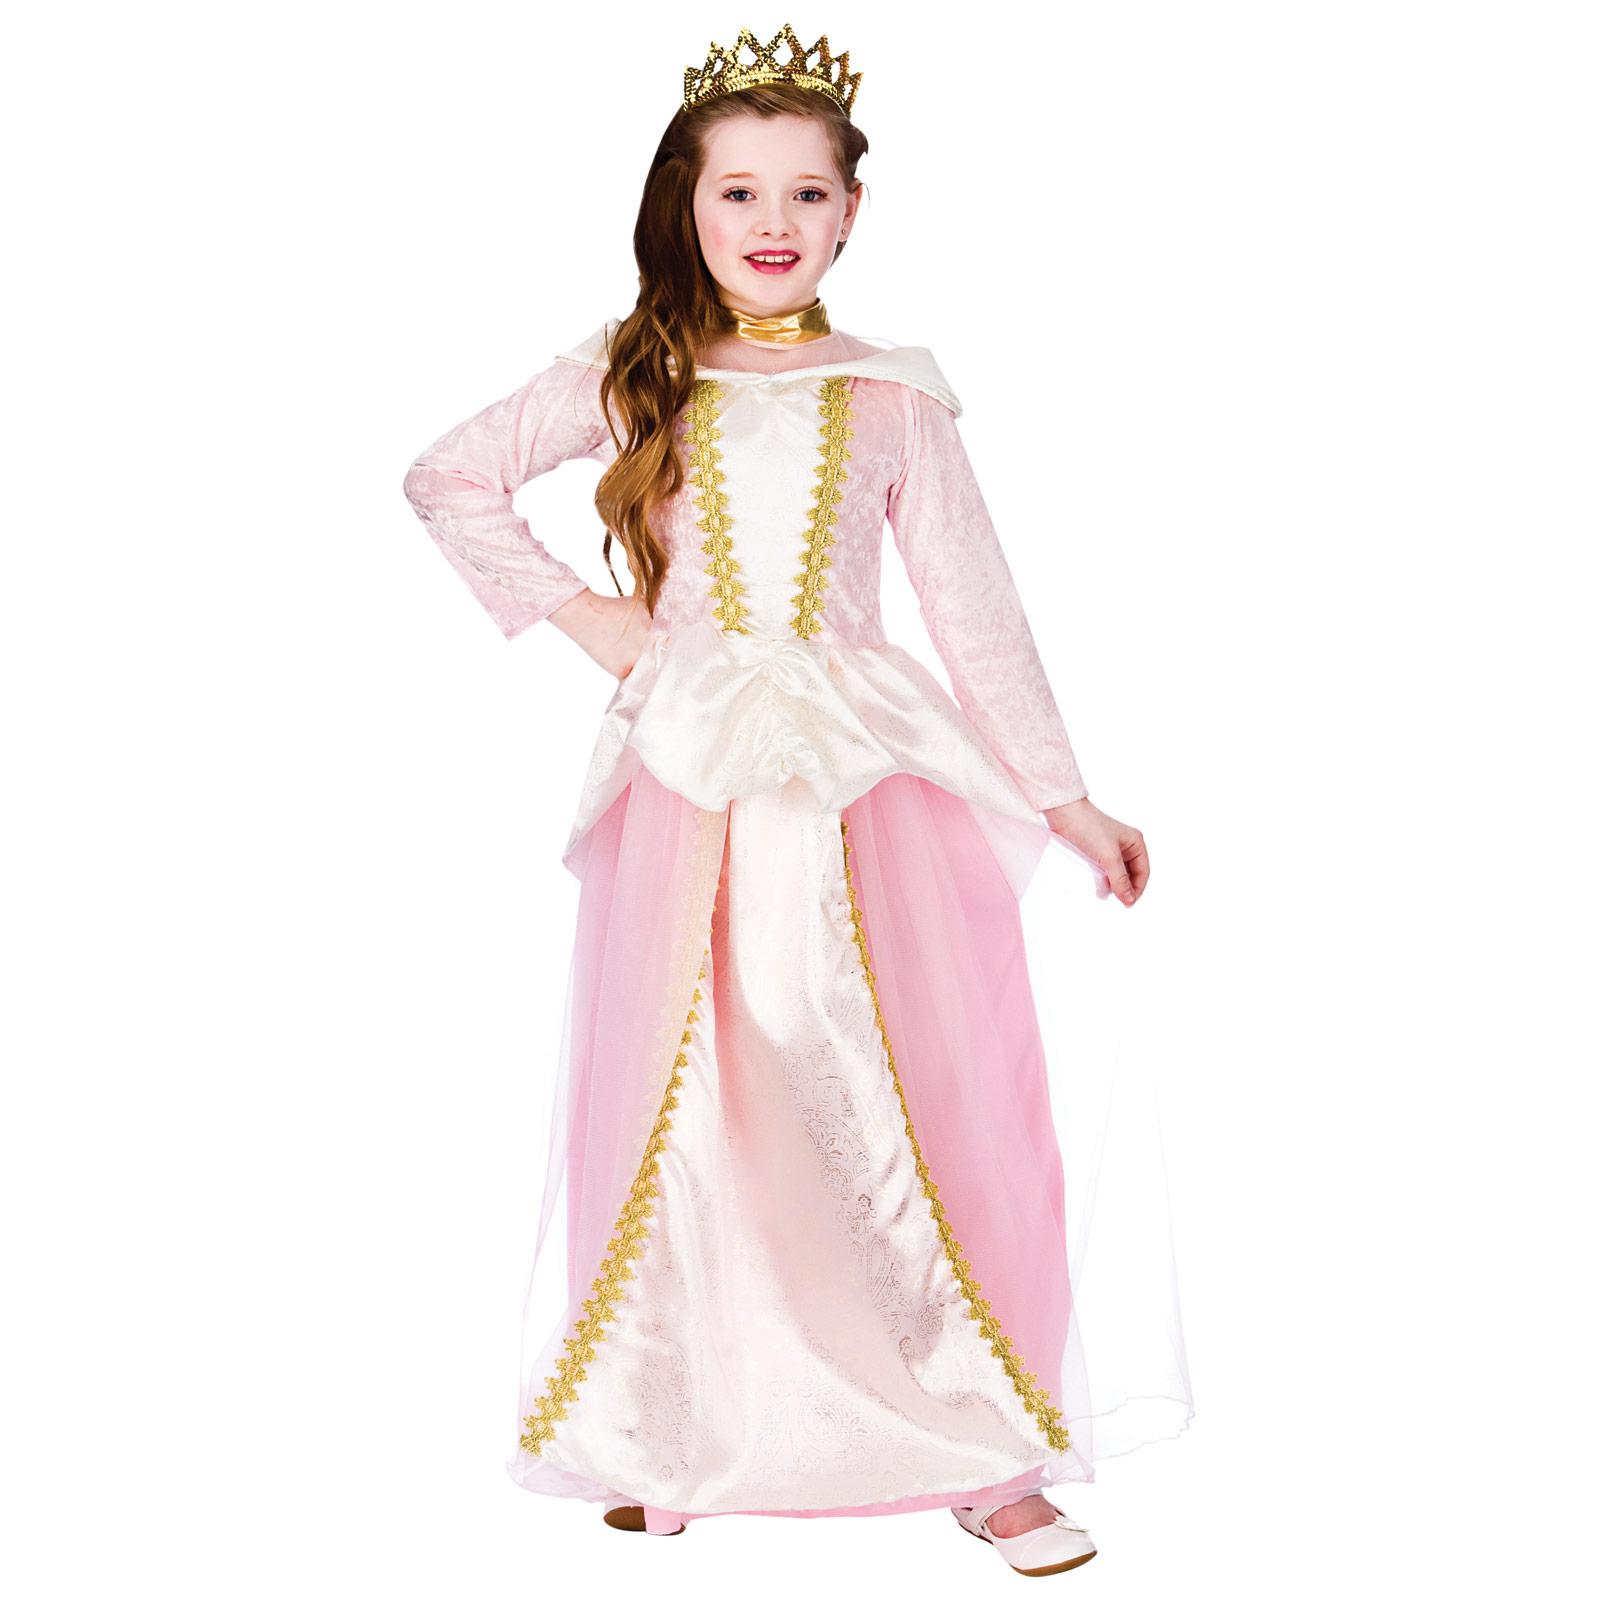 Halloween Girls Princess Fancy Dress Up Costume Outfits: Childrens Girls Fairytale Princess Halloween Fancy Dress